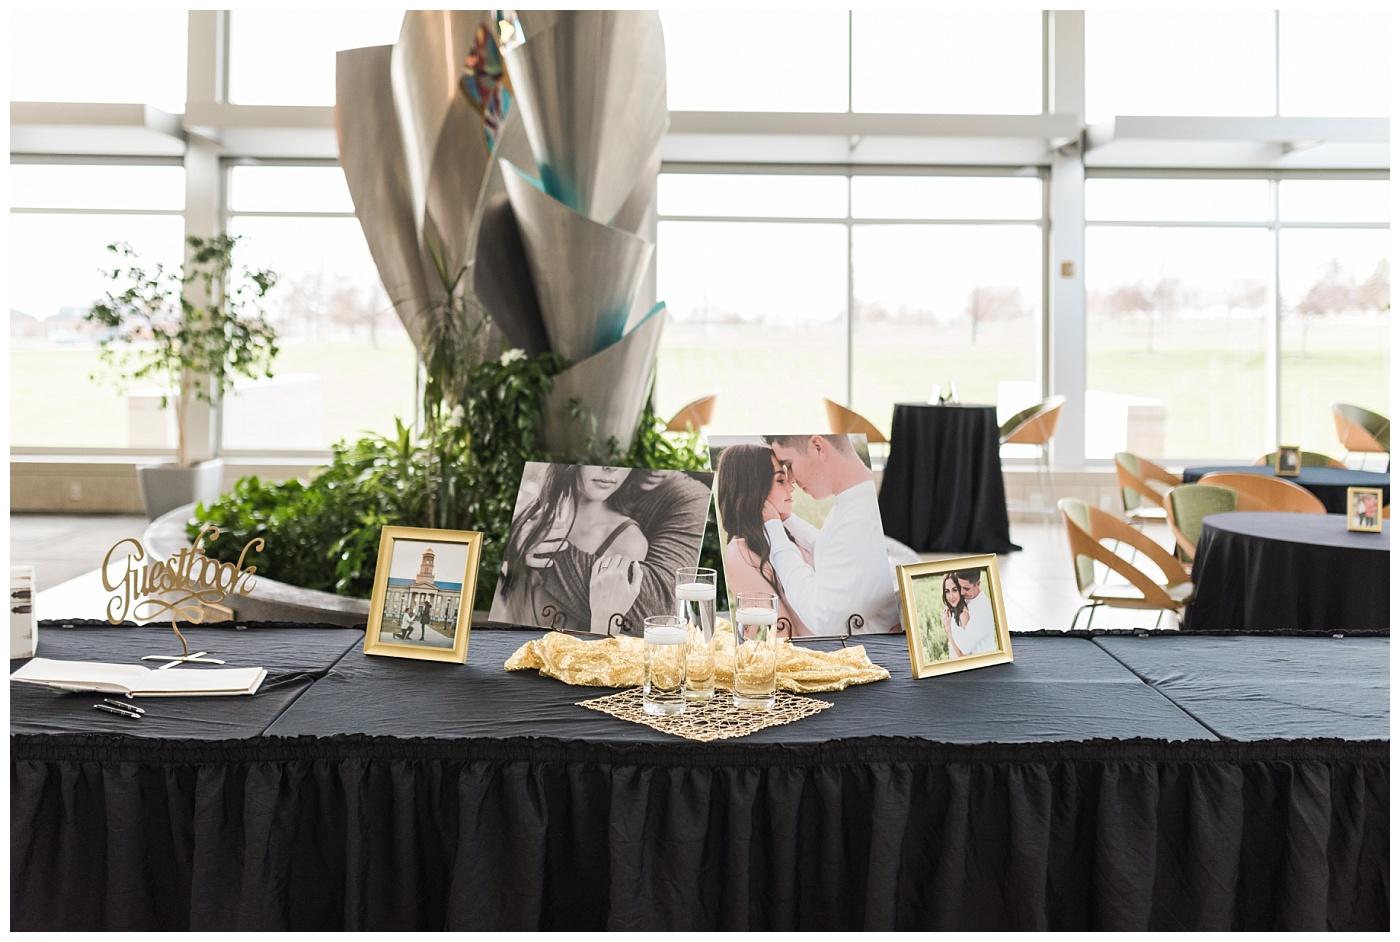 Stephanie Marie Photography Unitarian Universalist Society Church Ceremony Hotel Kirkwood Reception Cedar Rapids Iowa City Wedding Photographer Sean Madison Moore_0022.jpg